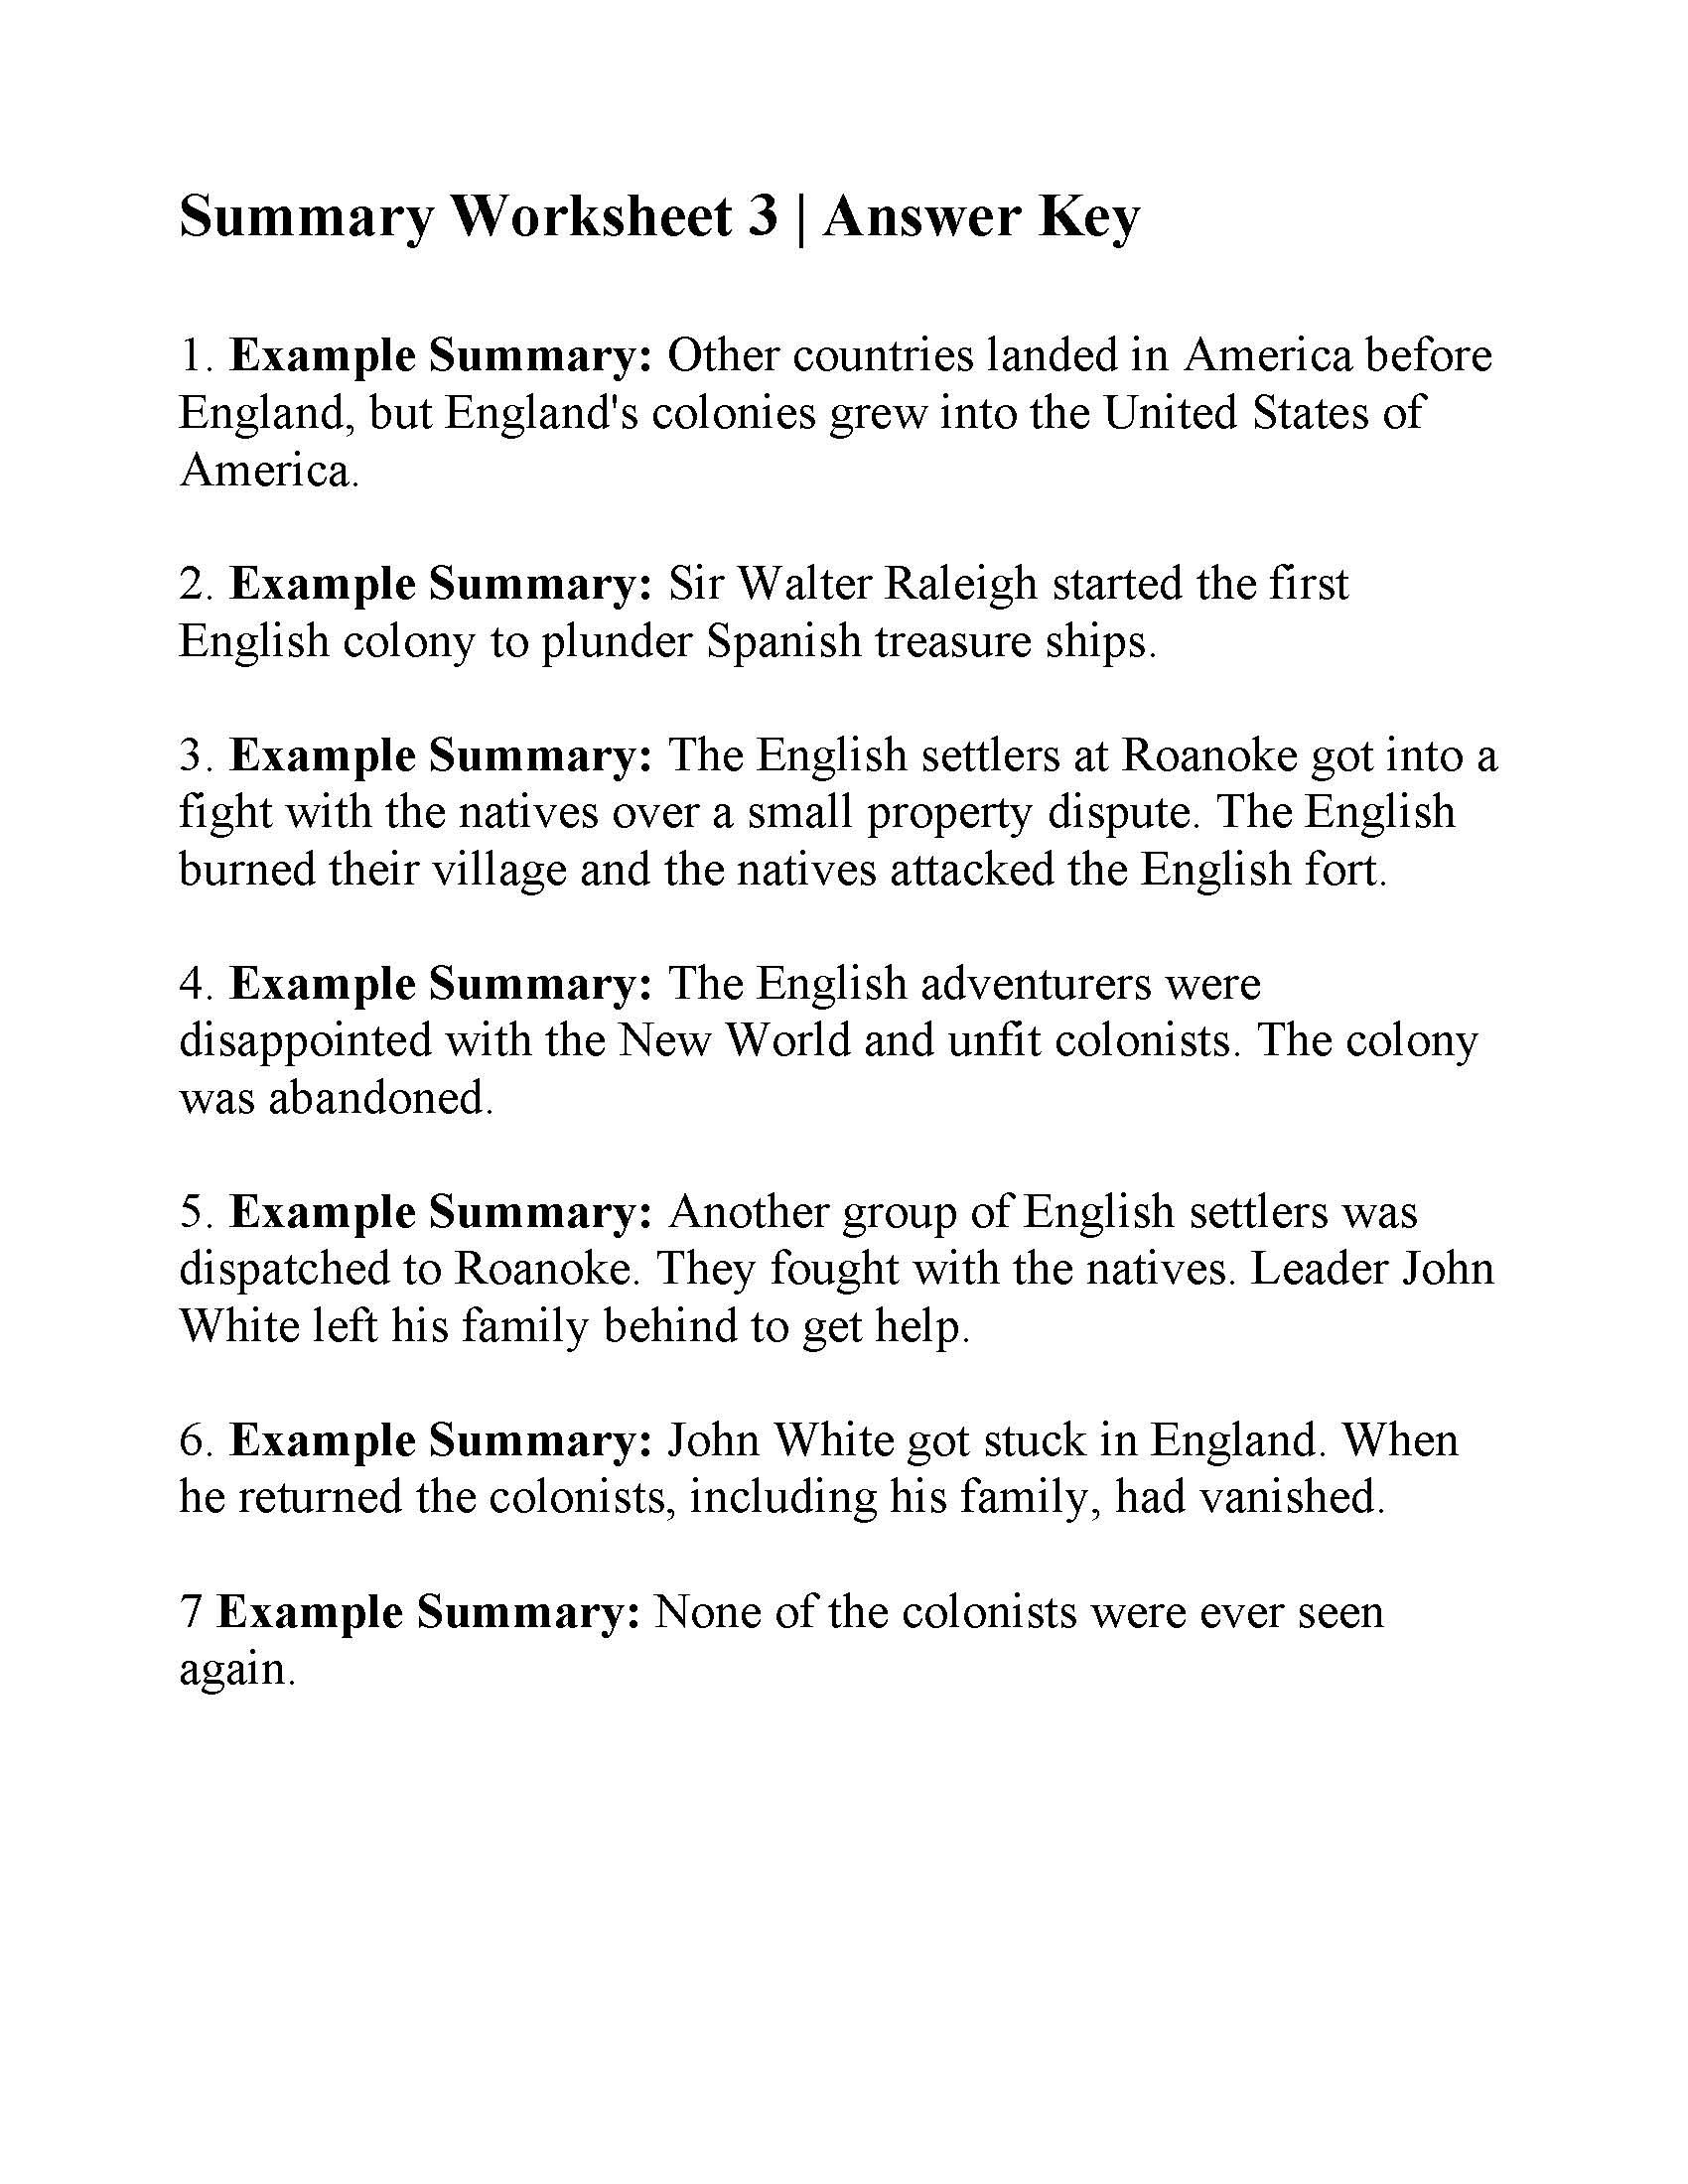 Summary Worksheet 3 Answers Summarizing Worksheet Reading Comprehension Worksheets 5th Grade Worksheets